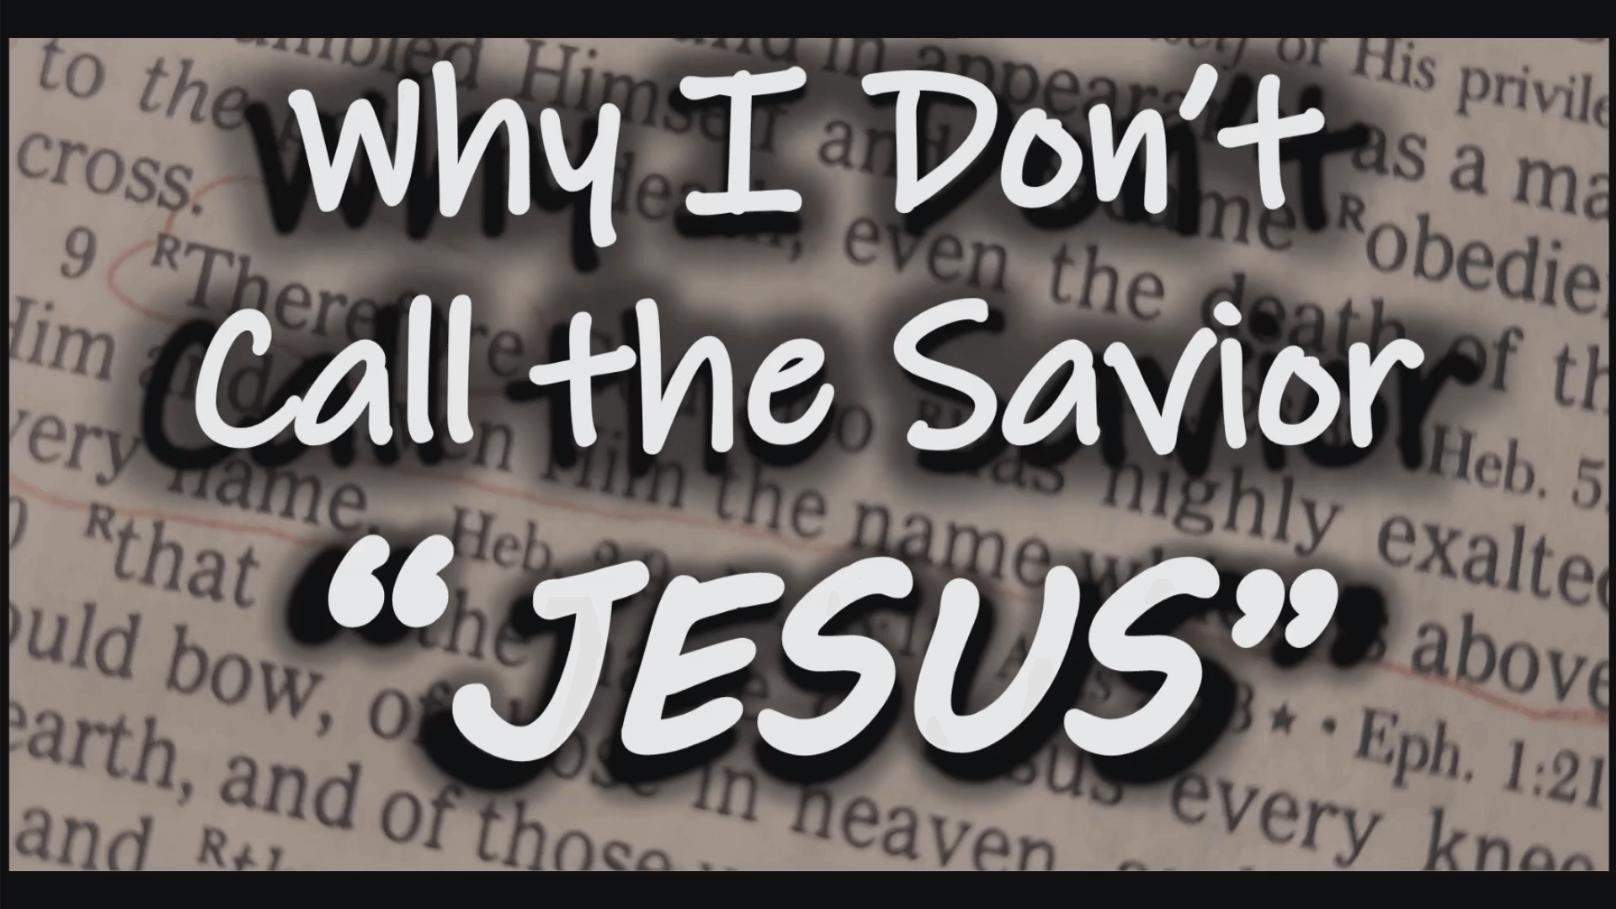 Why I Don't Call the Savior 'Jesus'